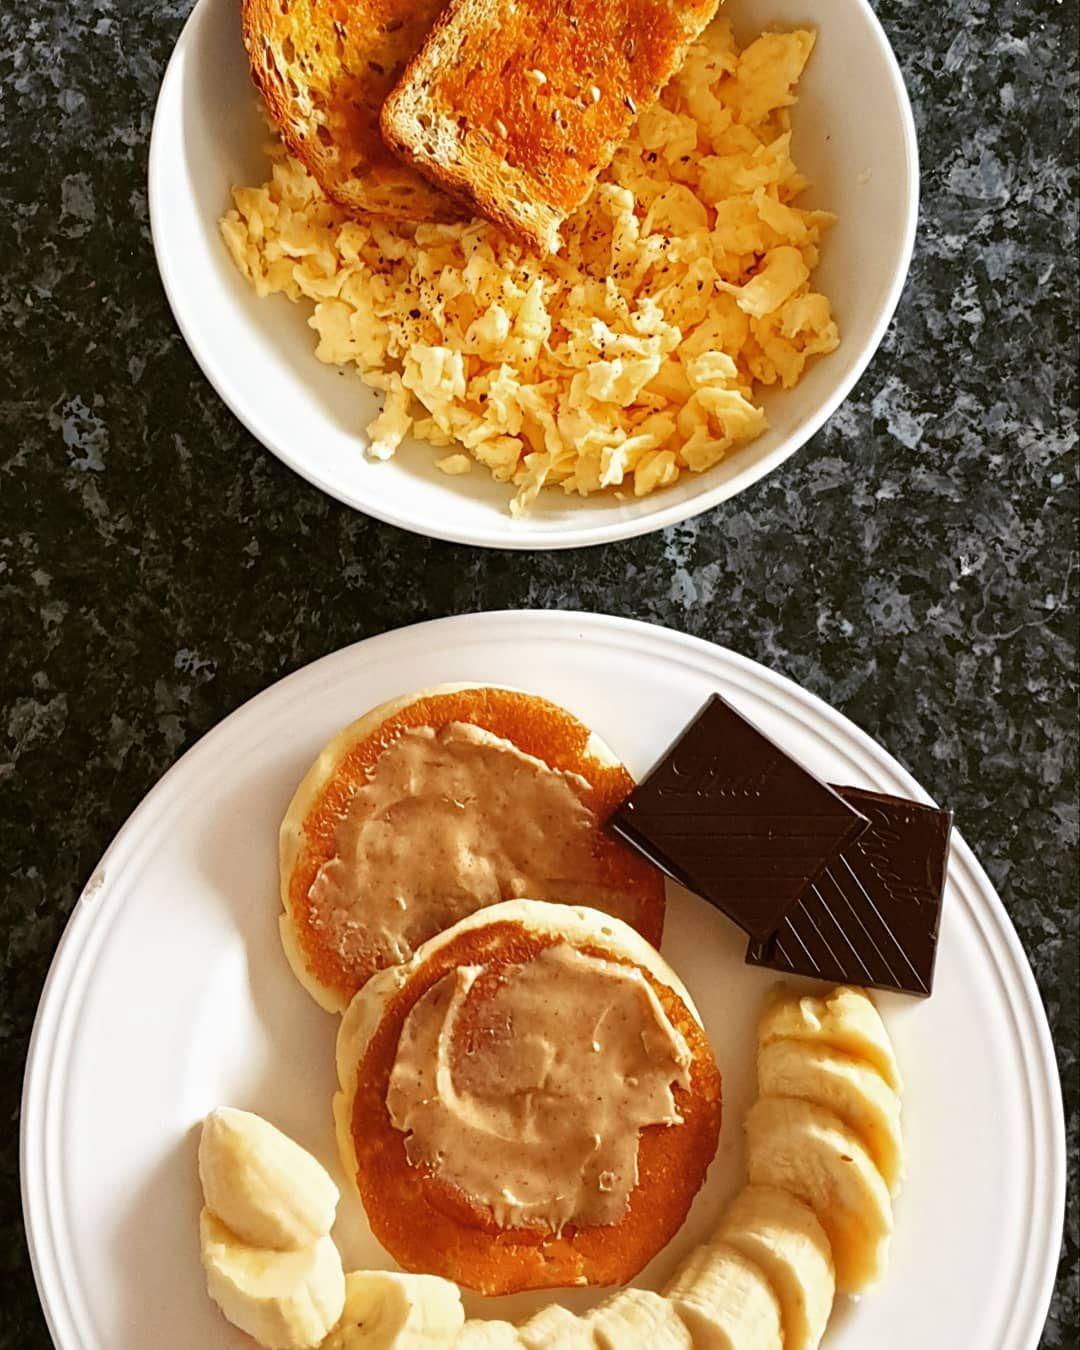 Breakfast 😋  #food #fitness #health #protien #calisthenics #love #strength #bodyweight #lean #gym